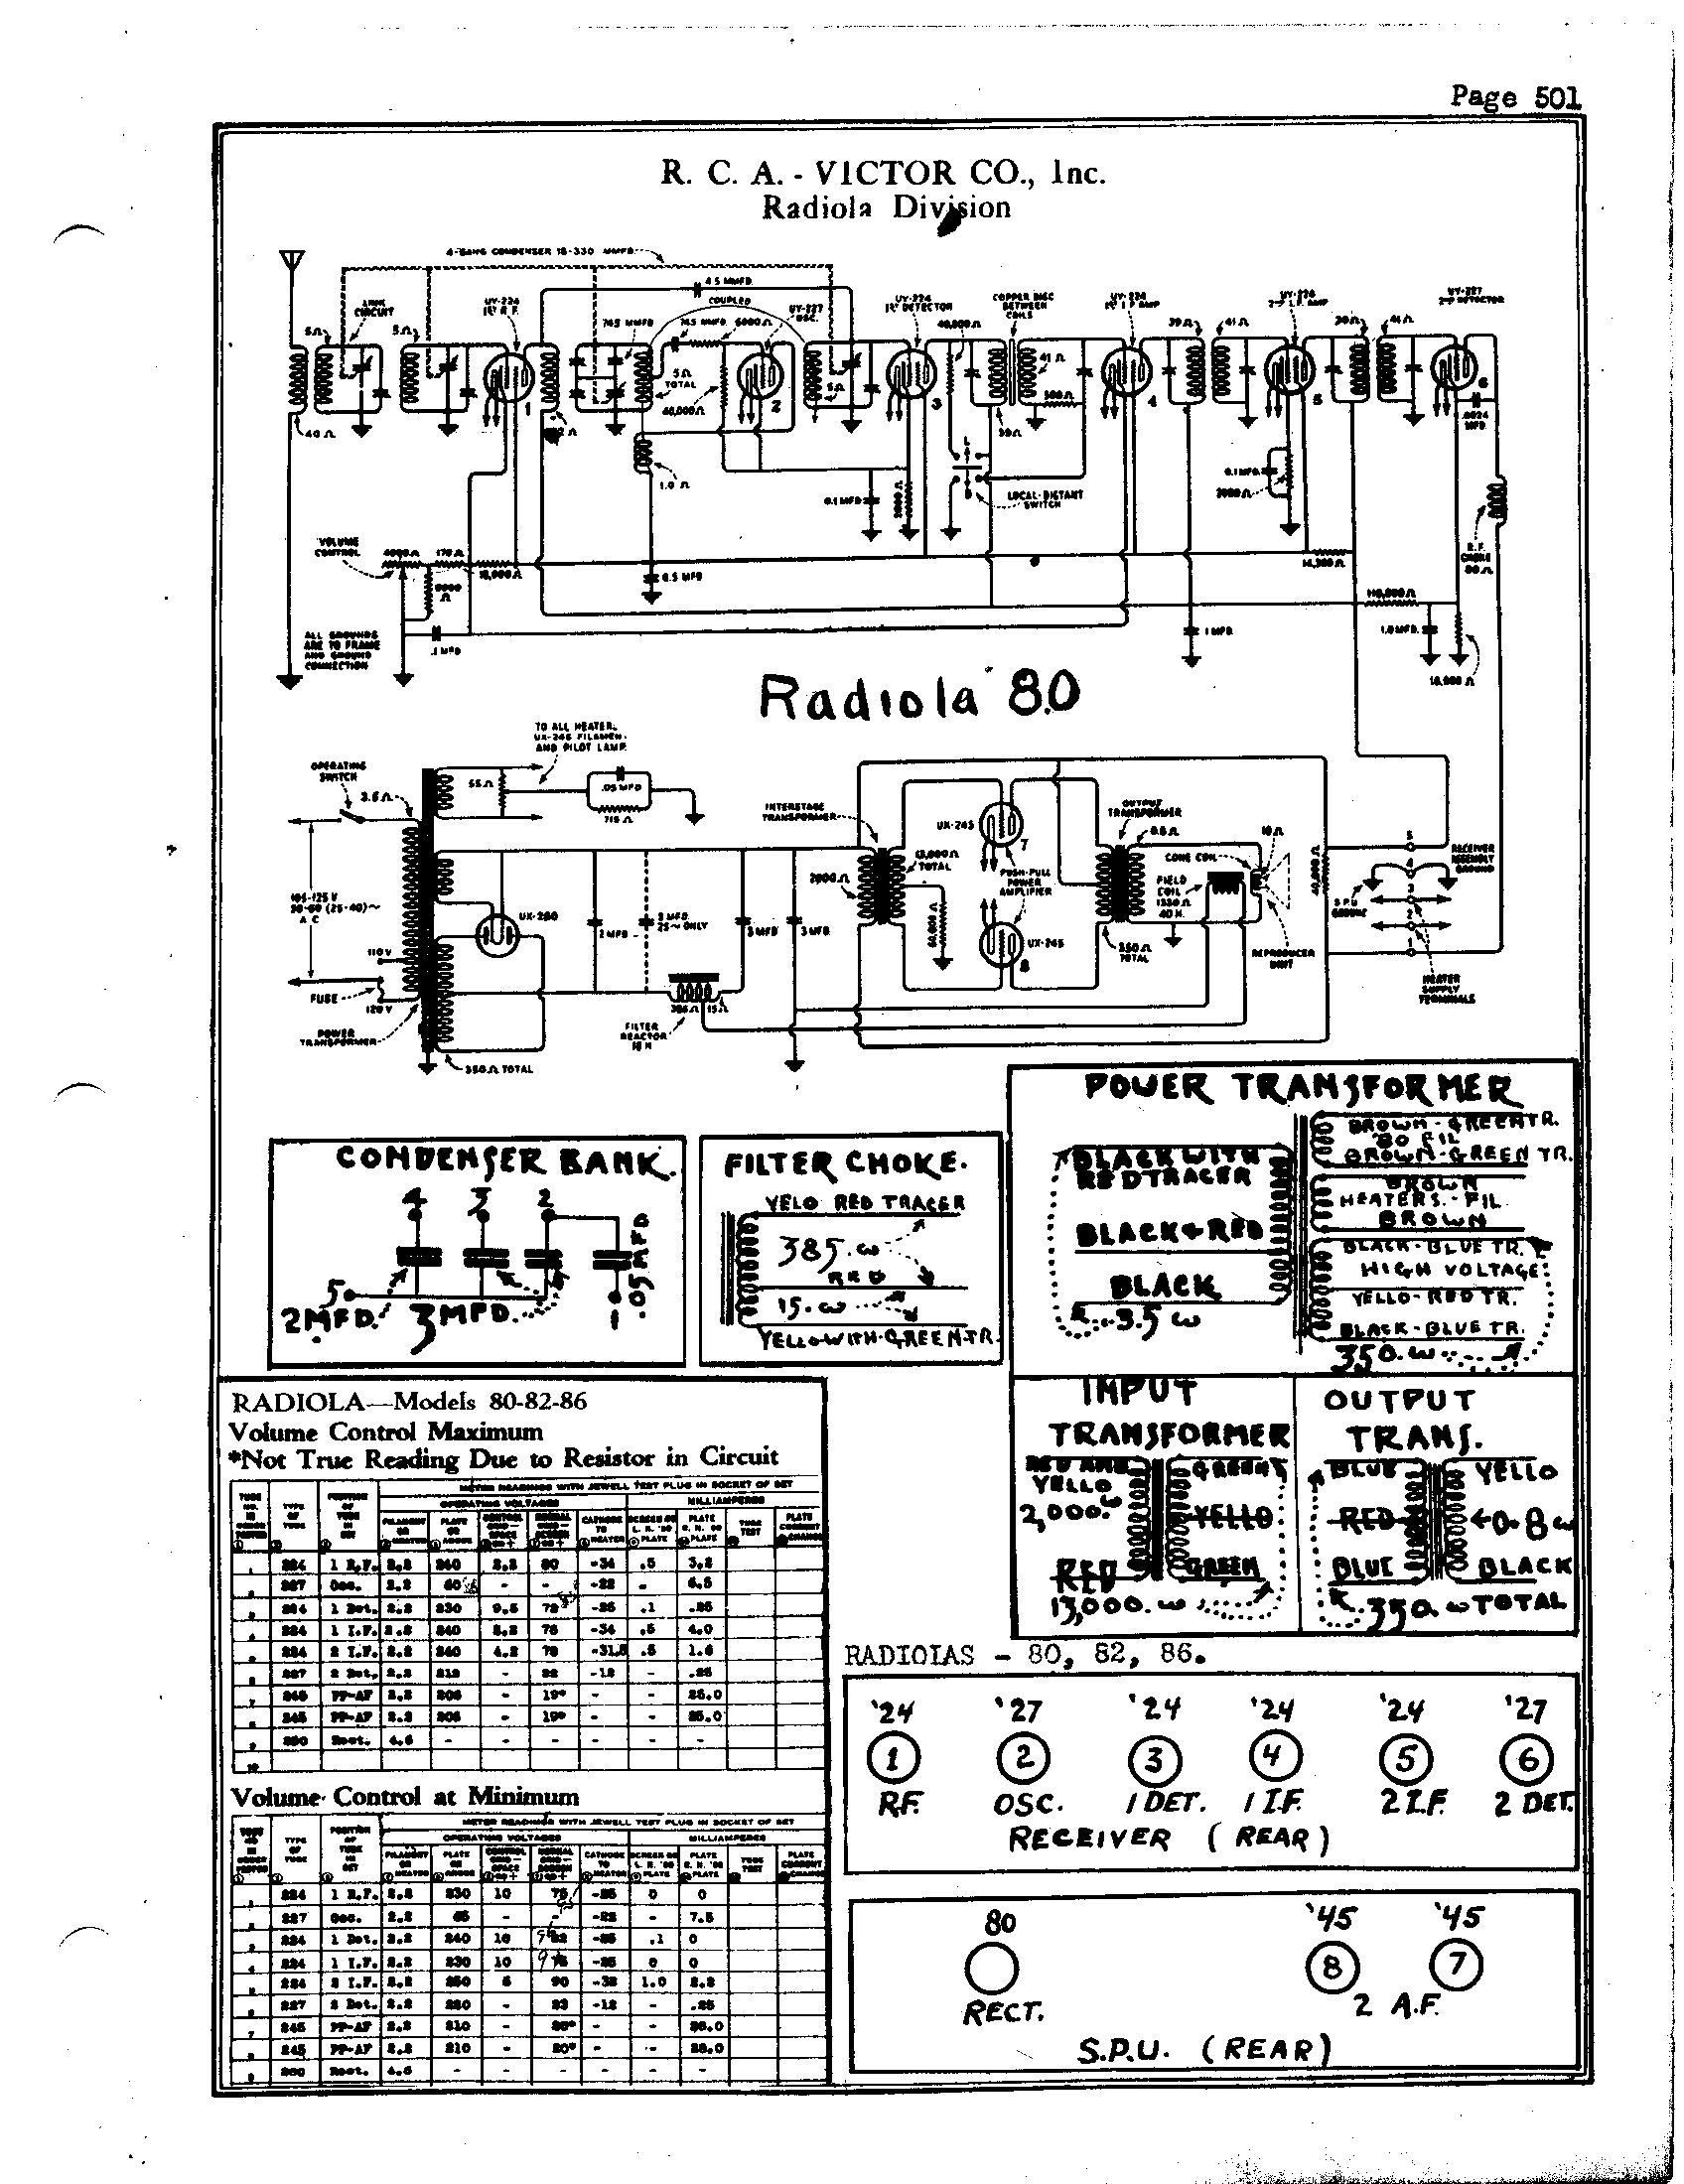 RCA Victor Co., Inc. 86 Remote Control Schematic on engine control schematic, laser schematic, keyboard schematic, control panel schematic, water control schematic, motor schematic, cruise control schematic,